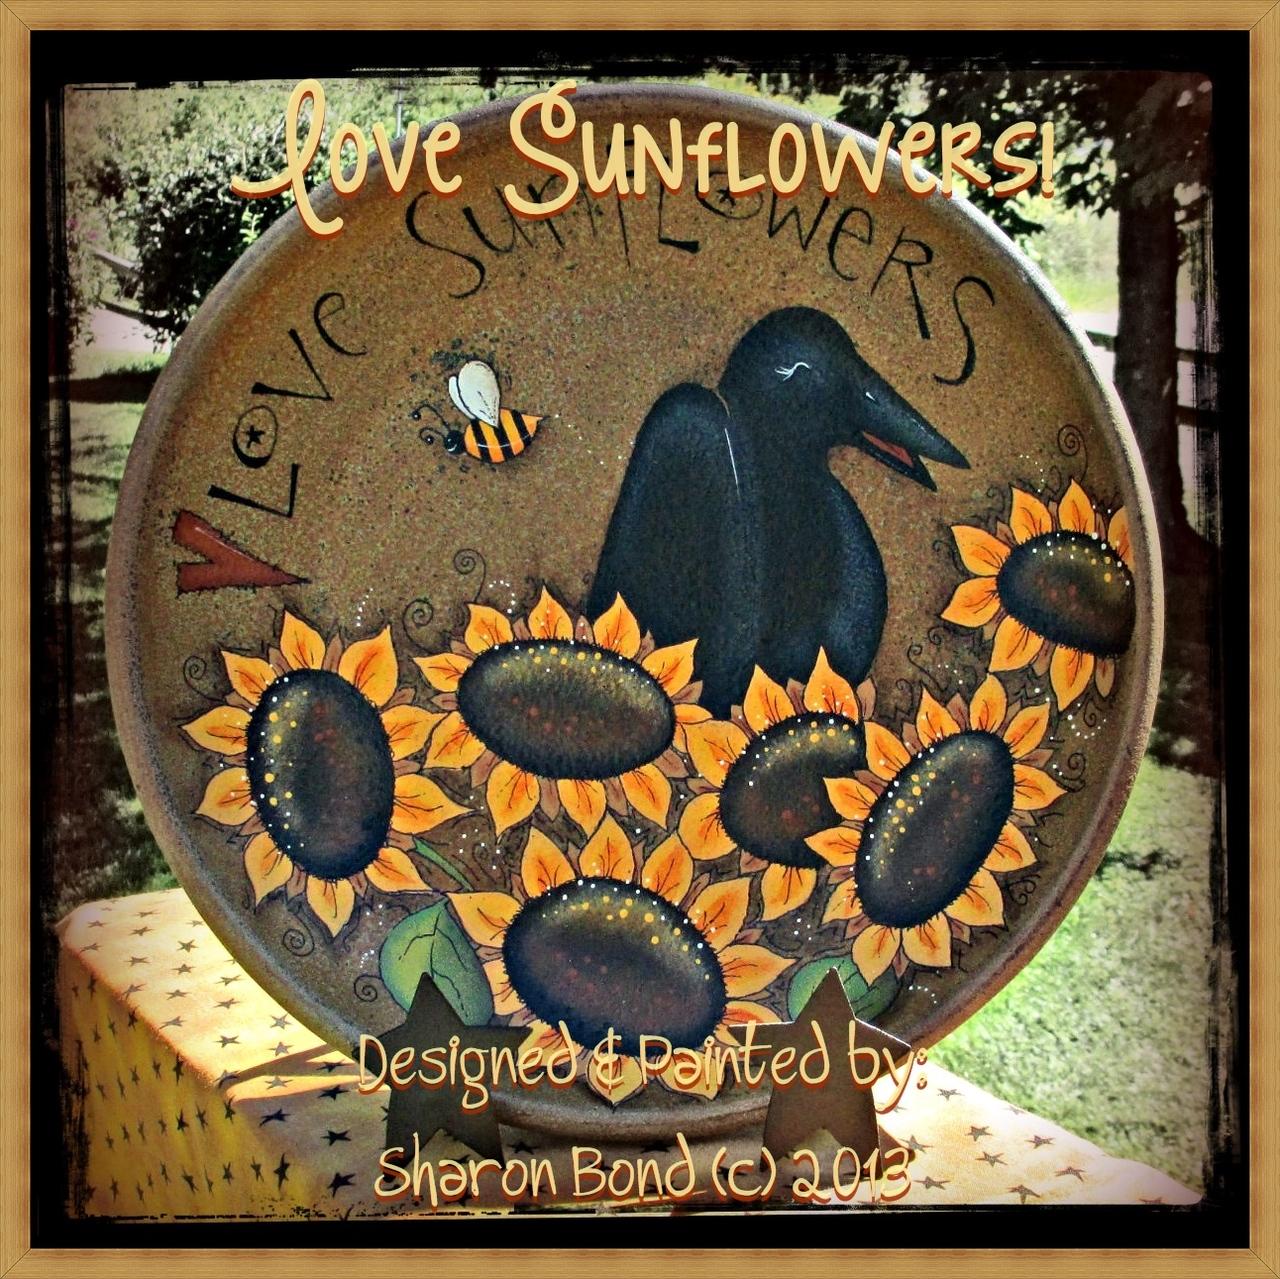 Love Sunflowers - E-Packet - Sharon Bond